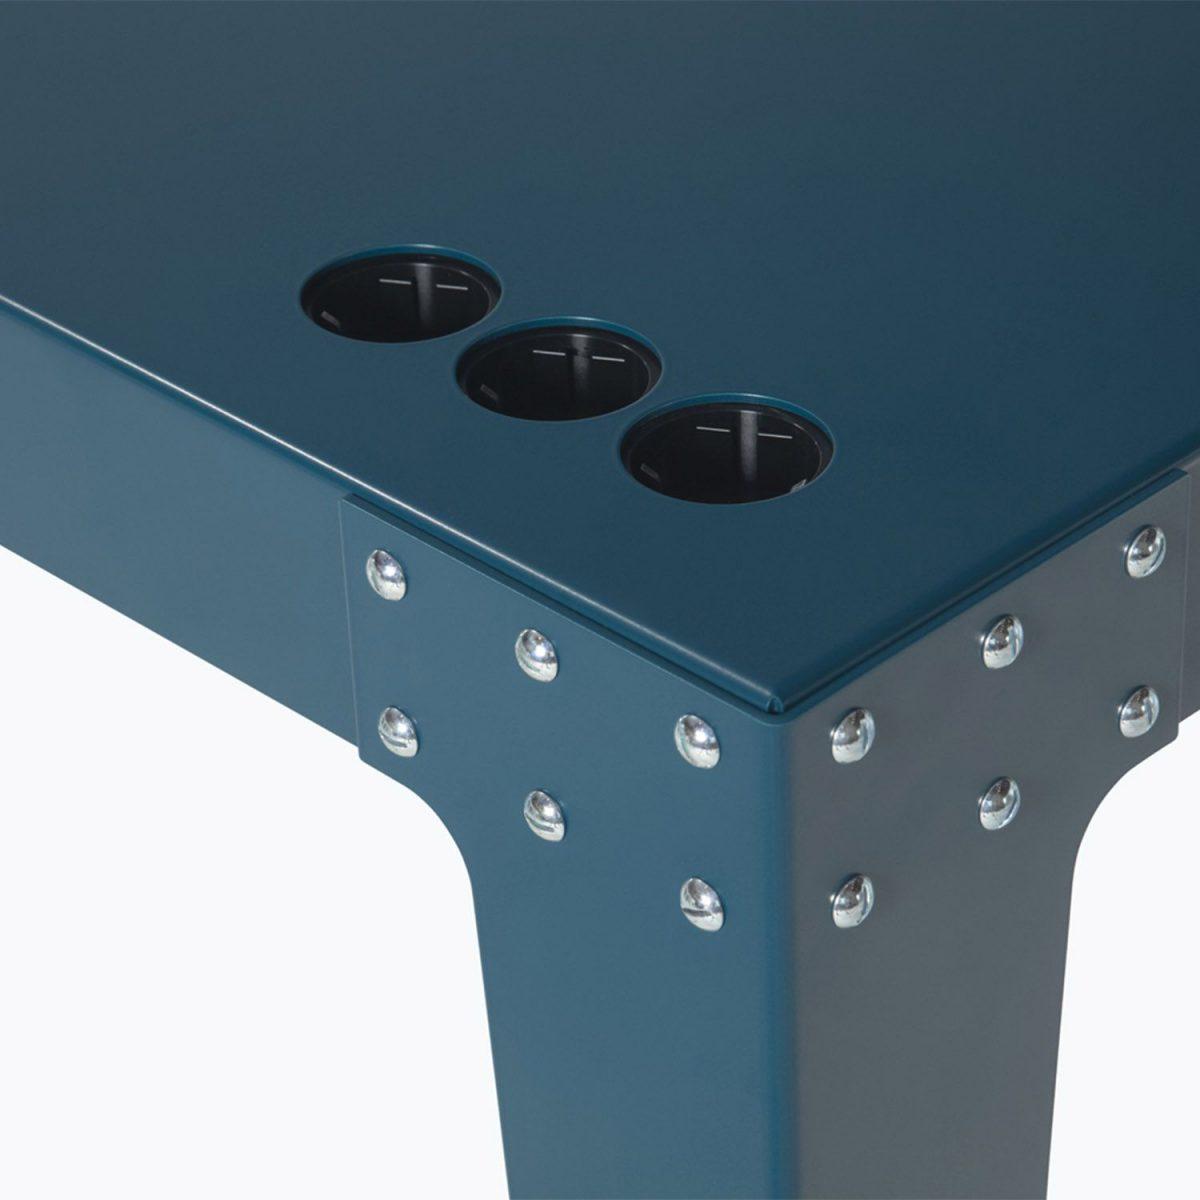 PHA1206 Lensvelt Bureau Detail Stopcontact Blauw Groen Turqoise Licht